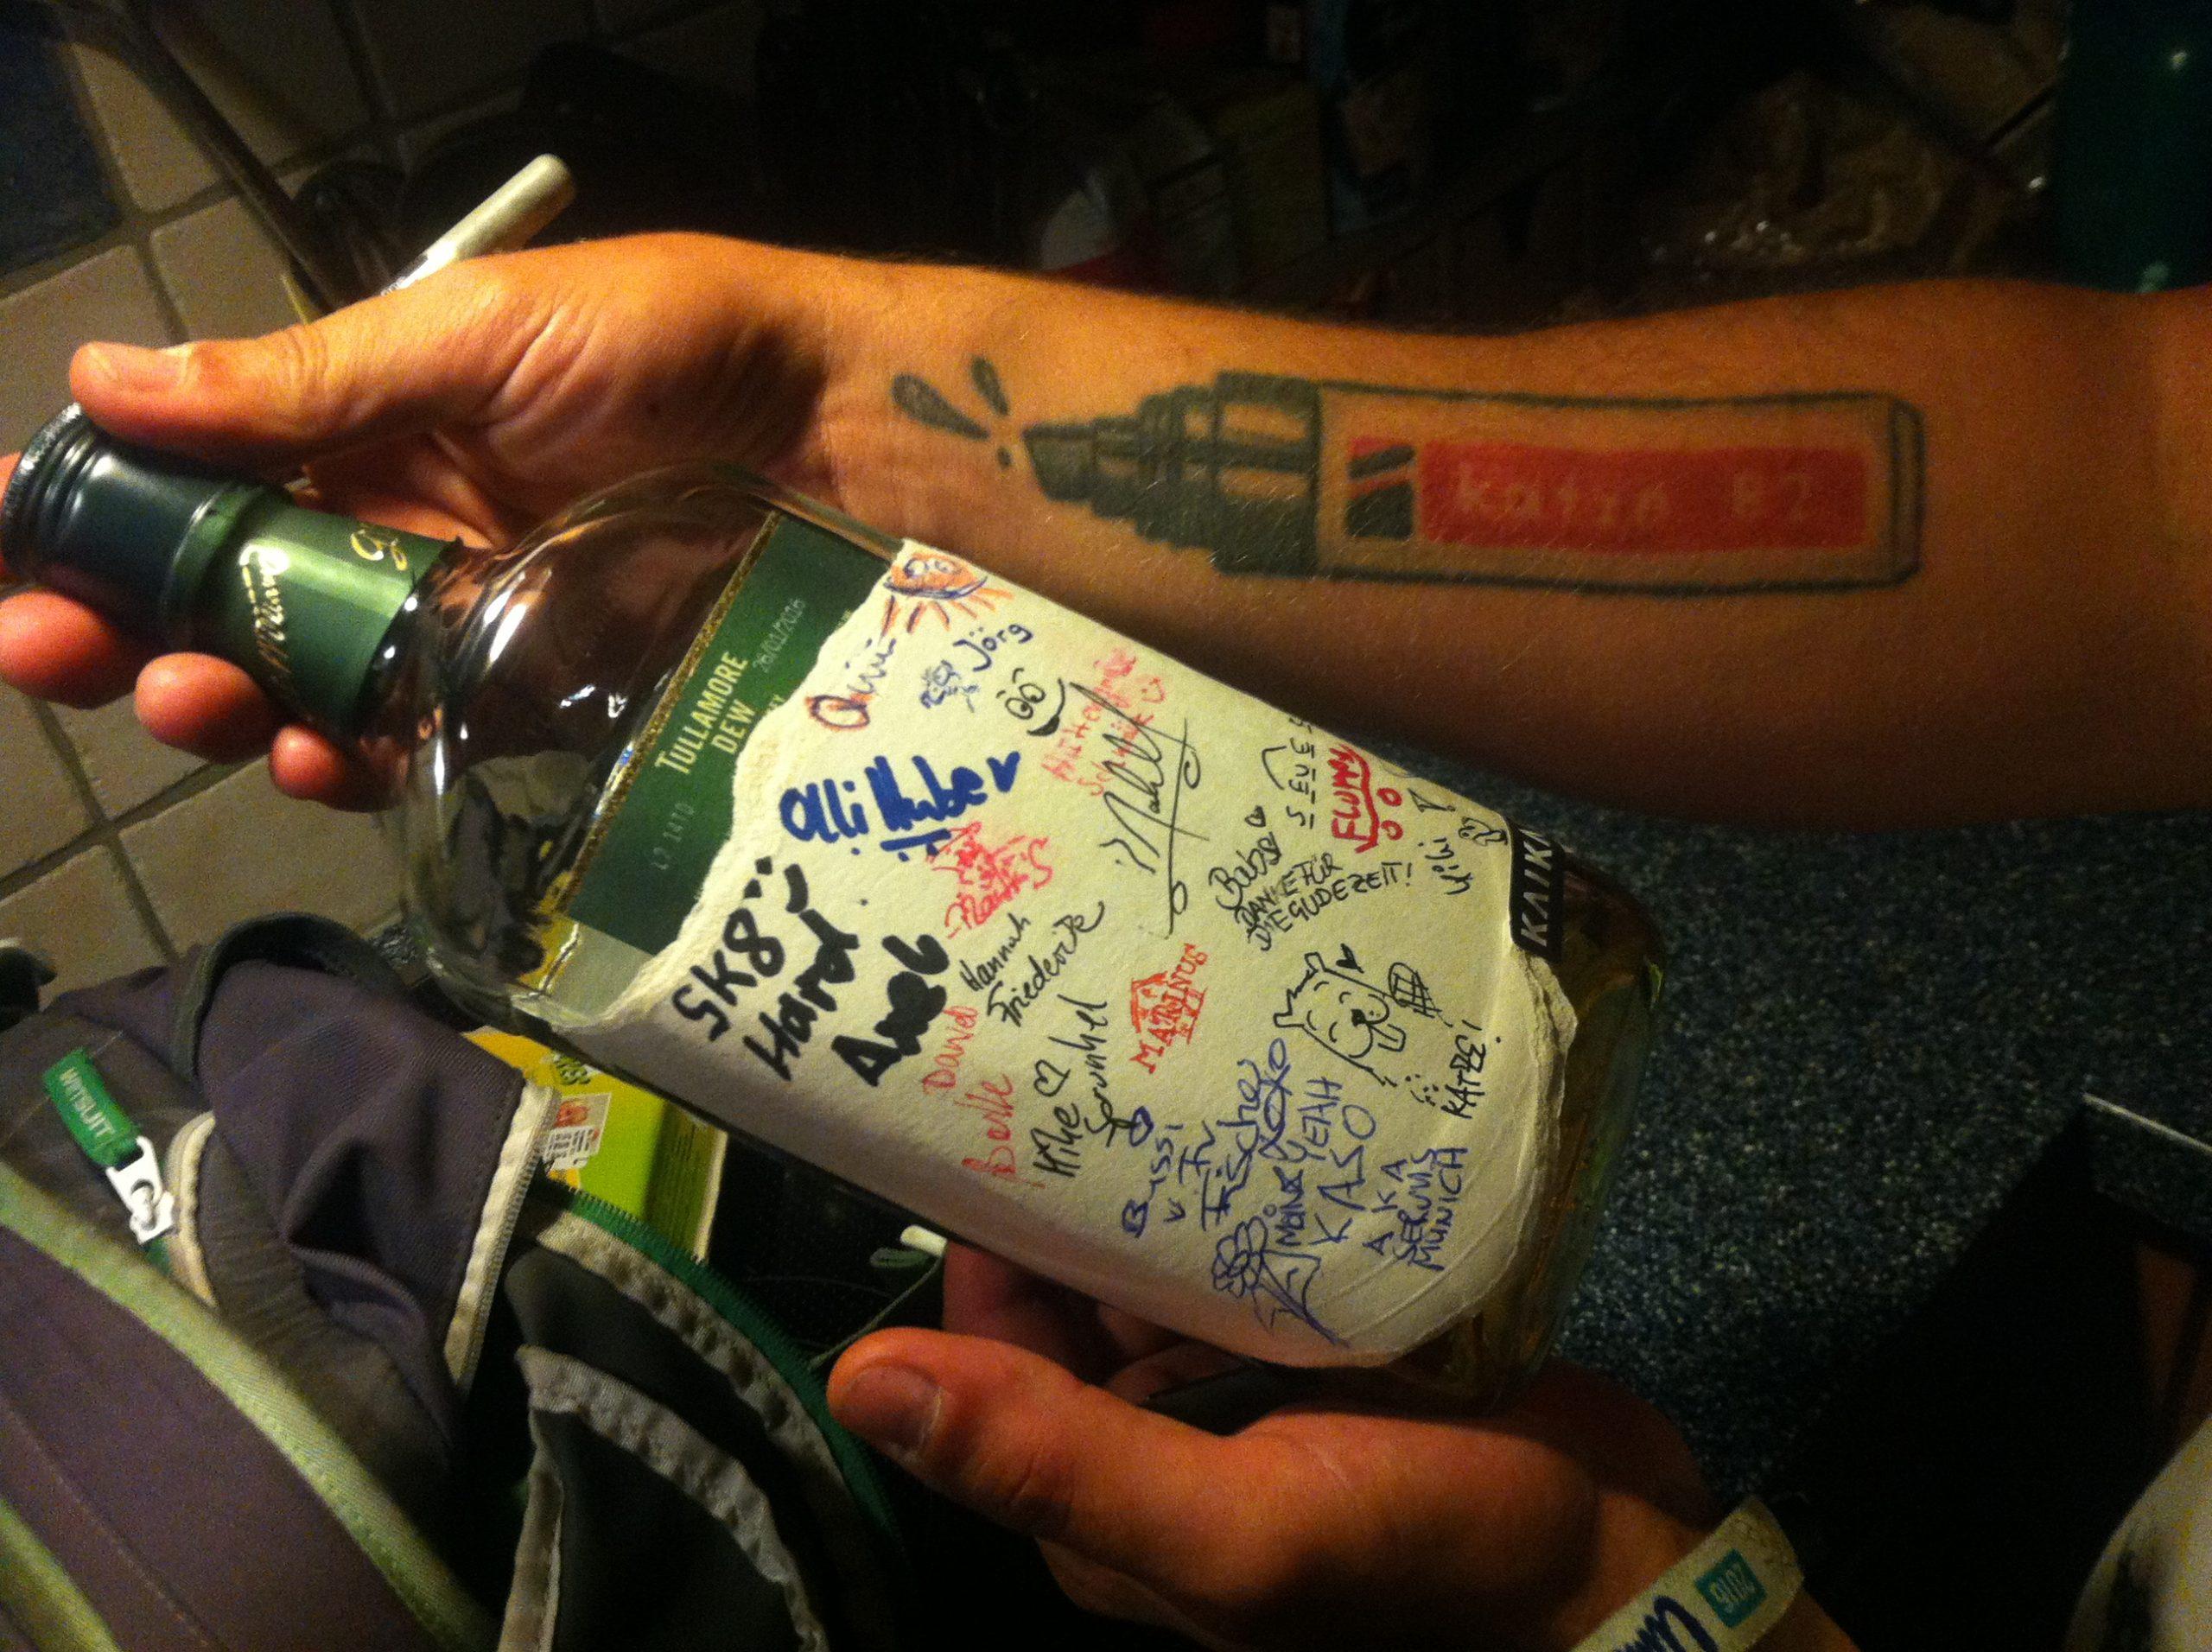 Tullamore DEW whiskey